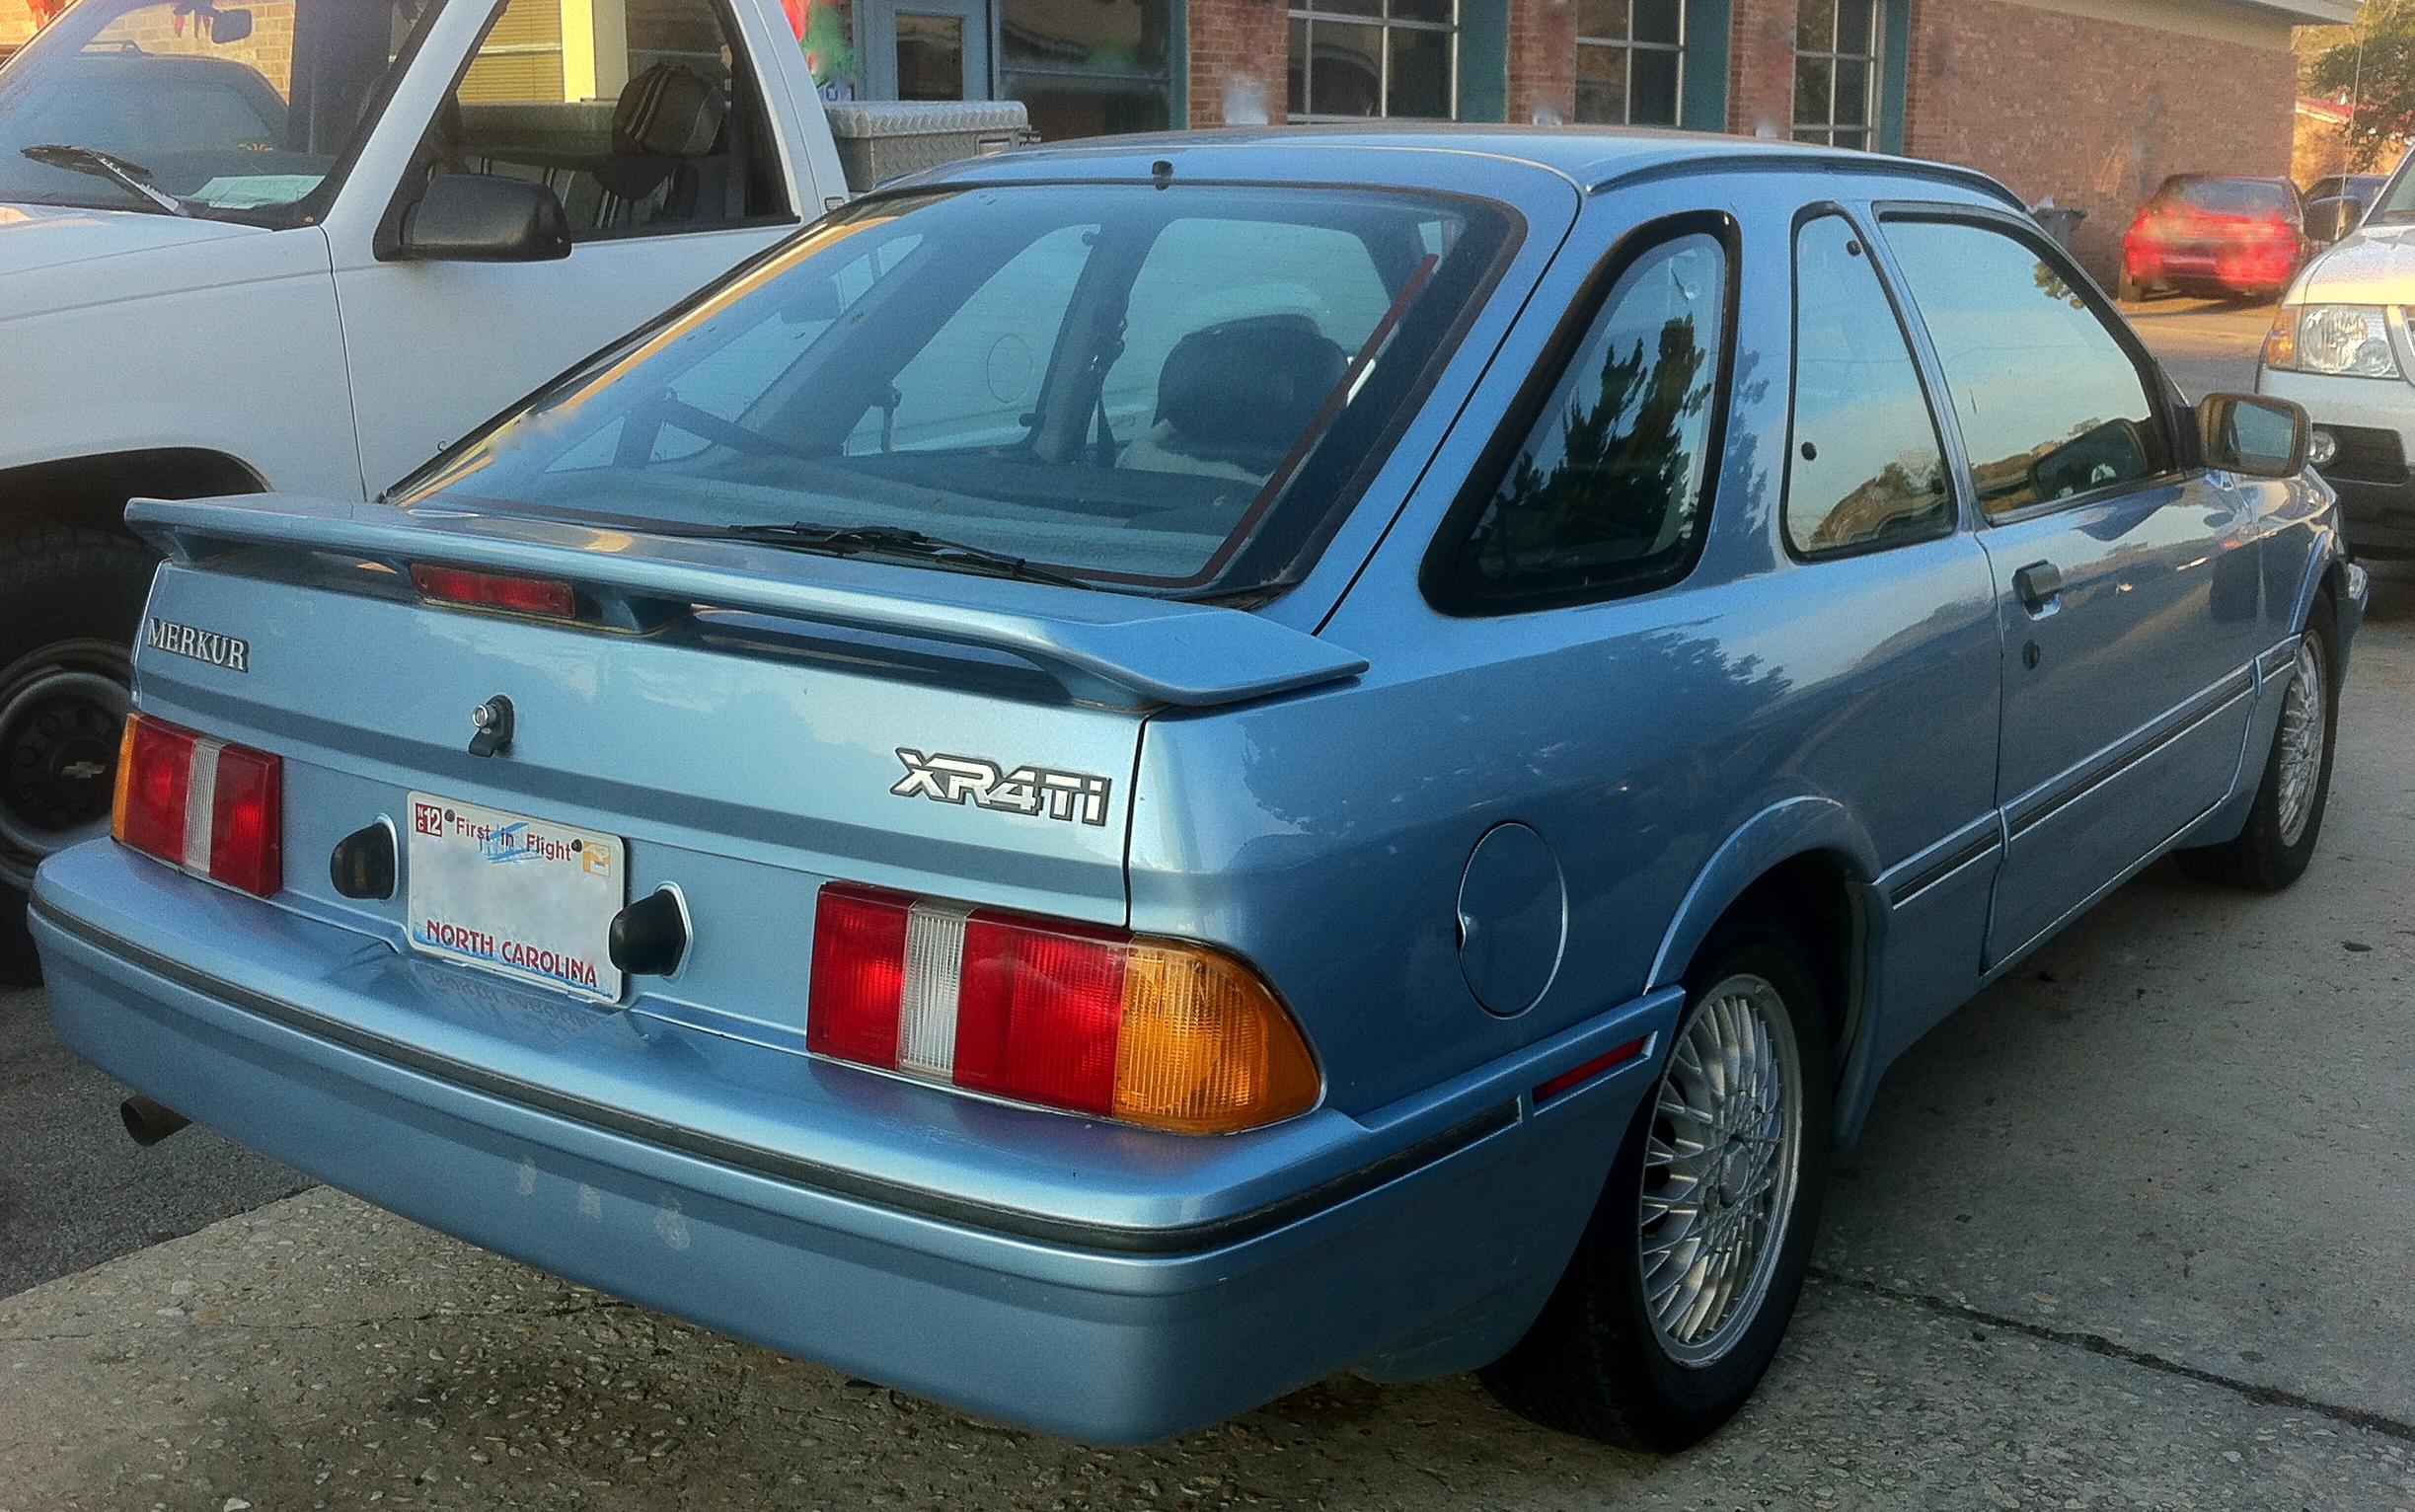 Used Cars In Usa >> File:Ford Merkur XR4Ti hatchback blue SOP.jpg - Wikimedia Commons